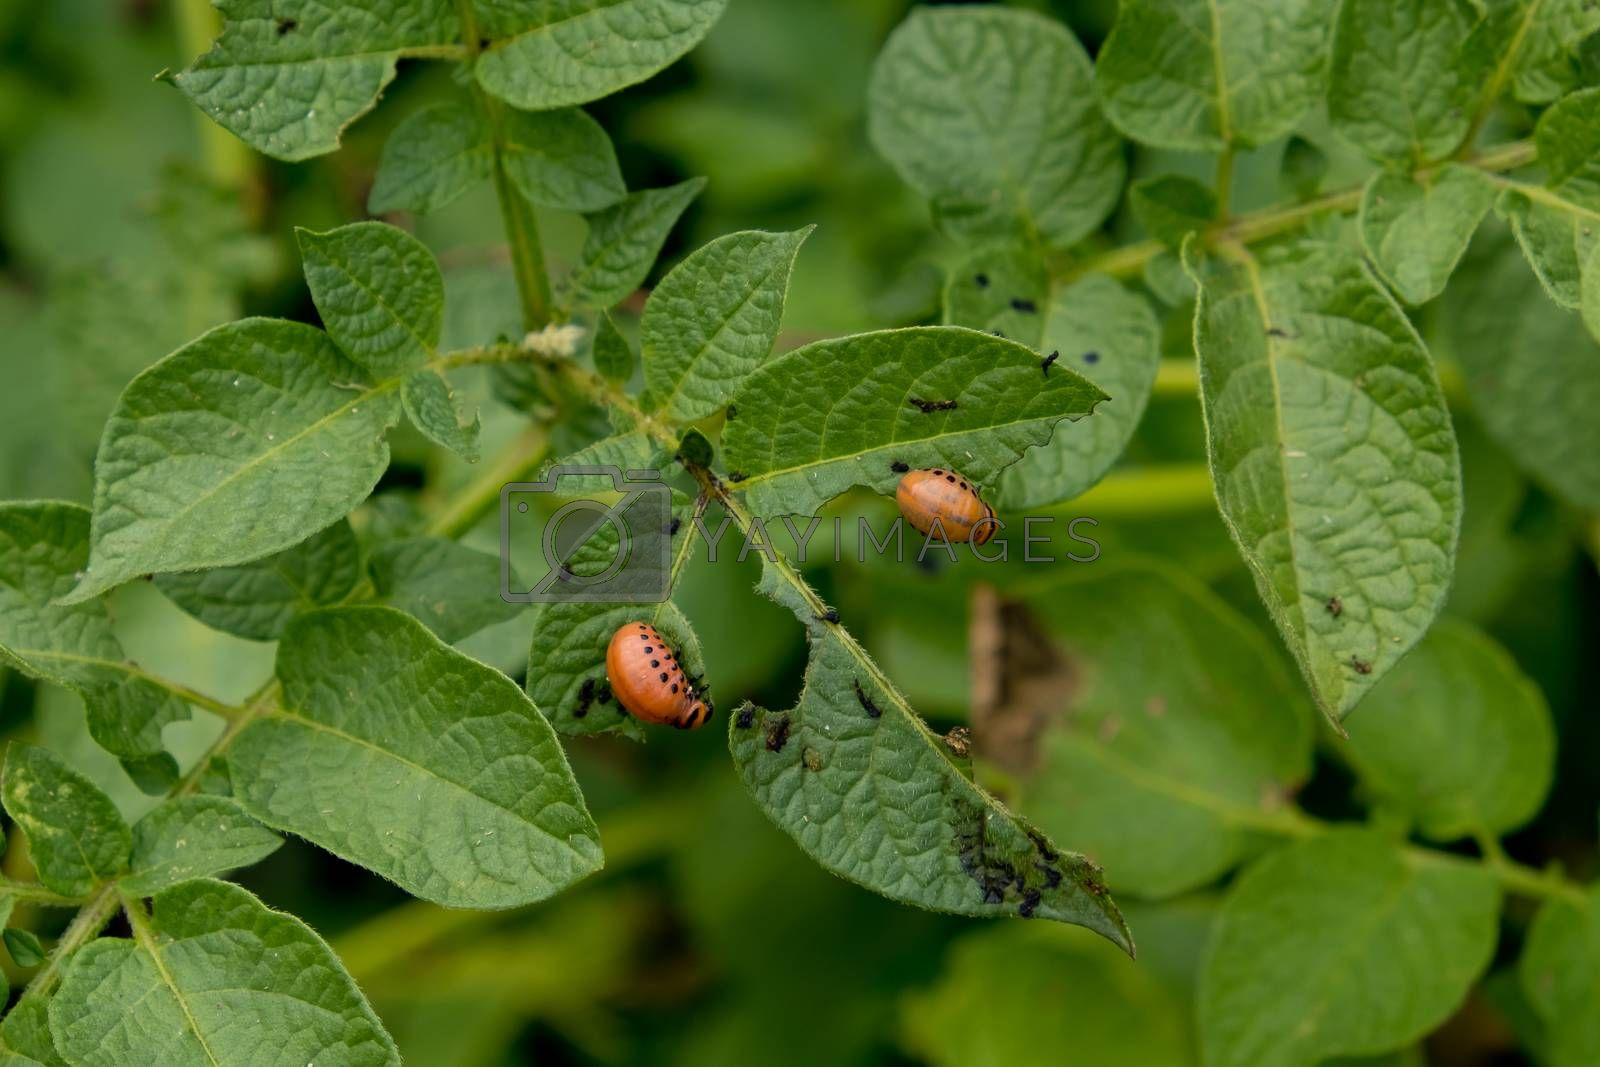 Colorado potato beetle larva eats potato leafs.